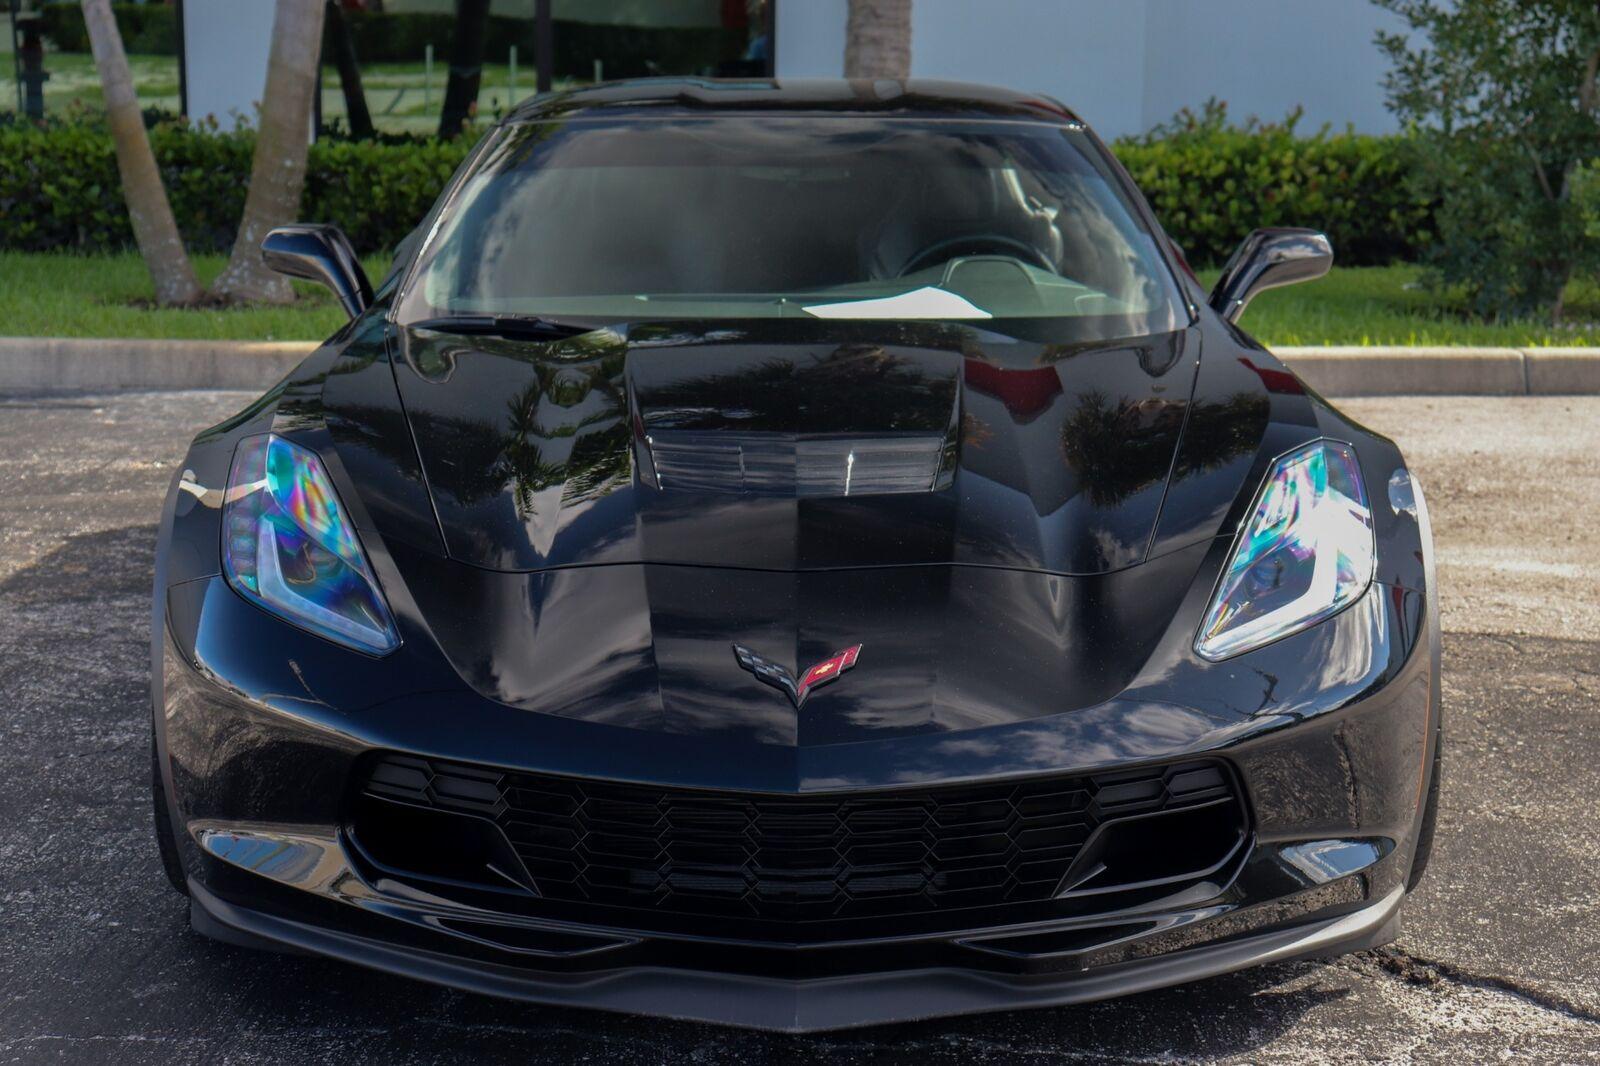 2018 Black Chevrolet Corvette Grand Sport    C7 Corvette Photo 9